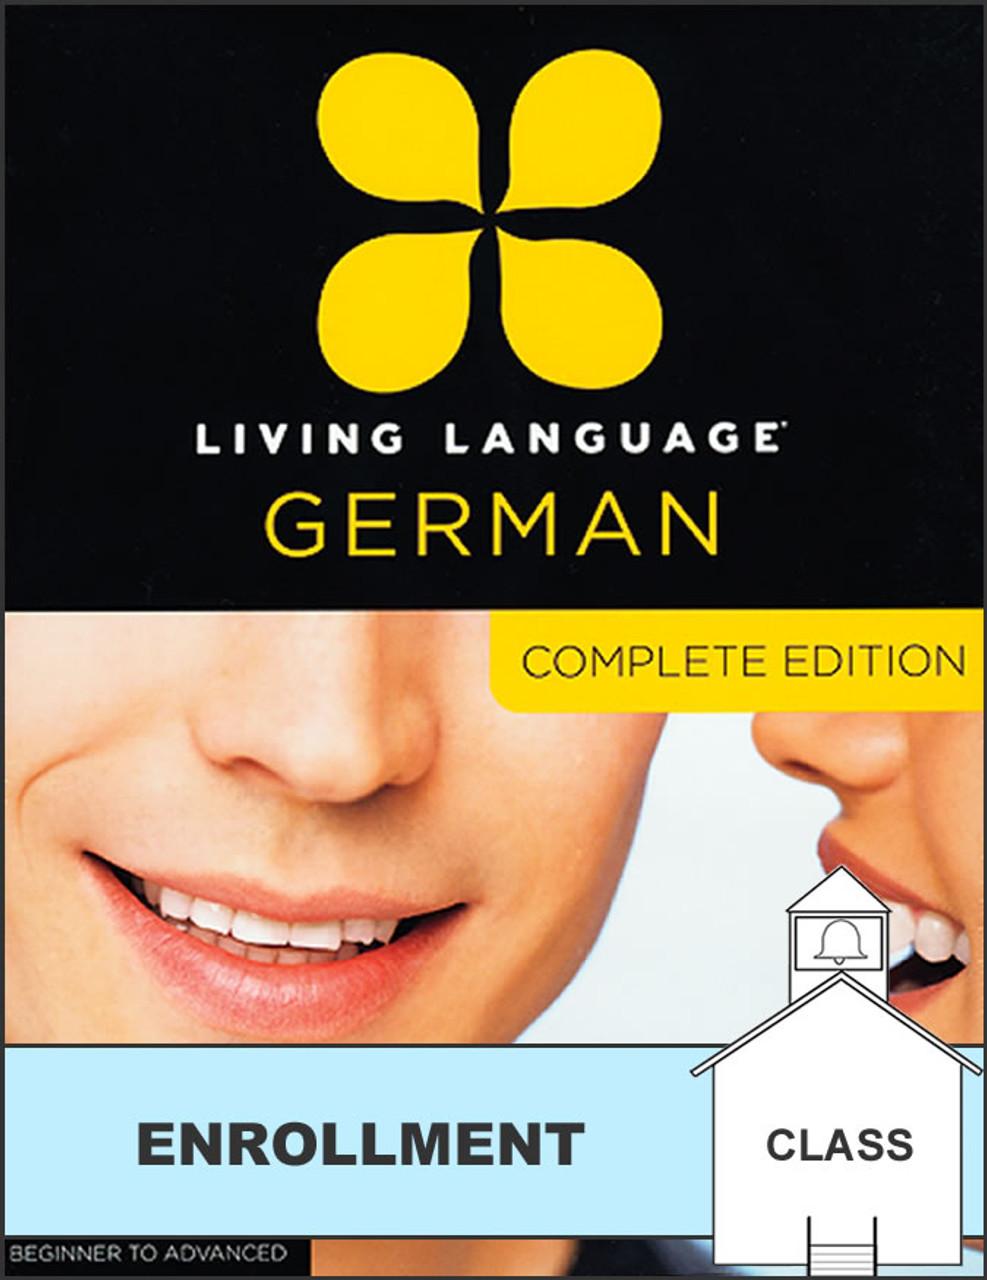 Living Language German: Complete Edition